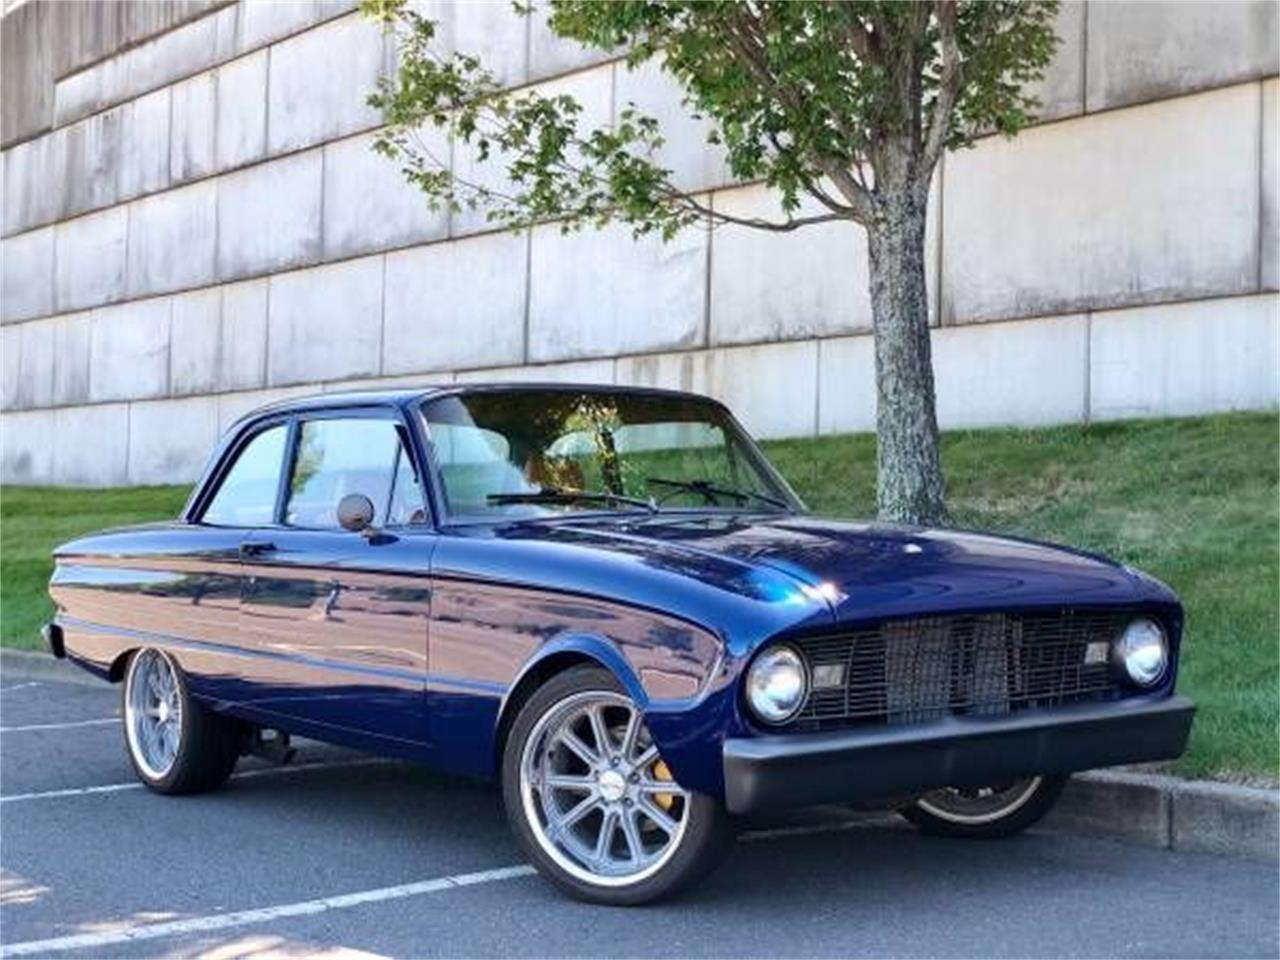 1961 Ford Falcon For Sale Classiccars Com Cc 1299700